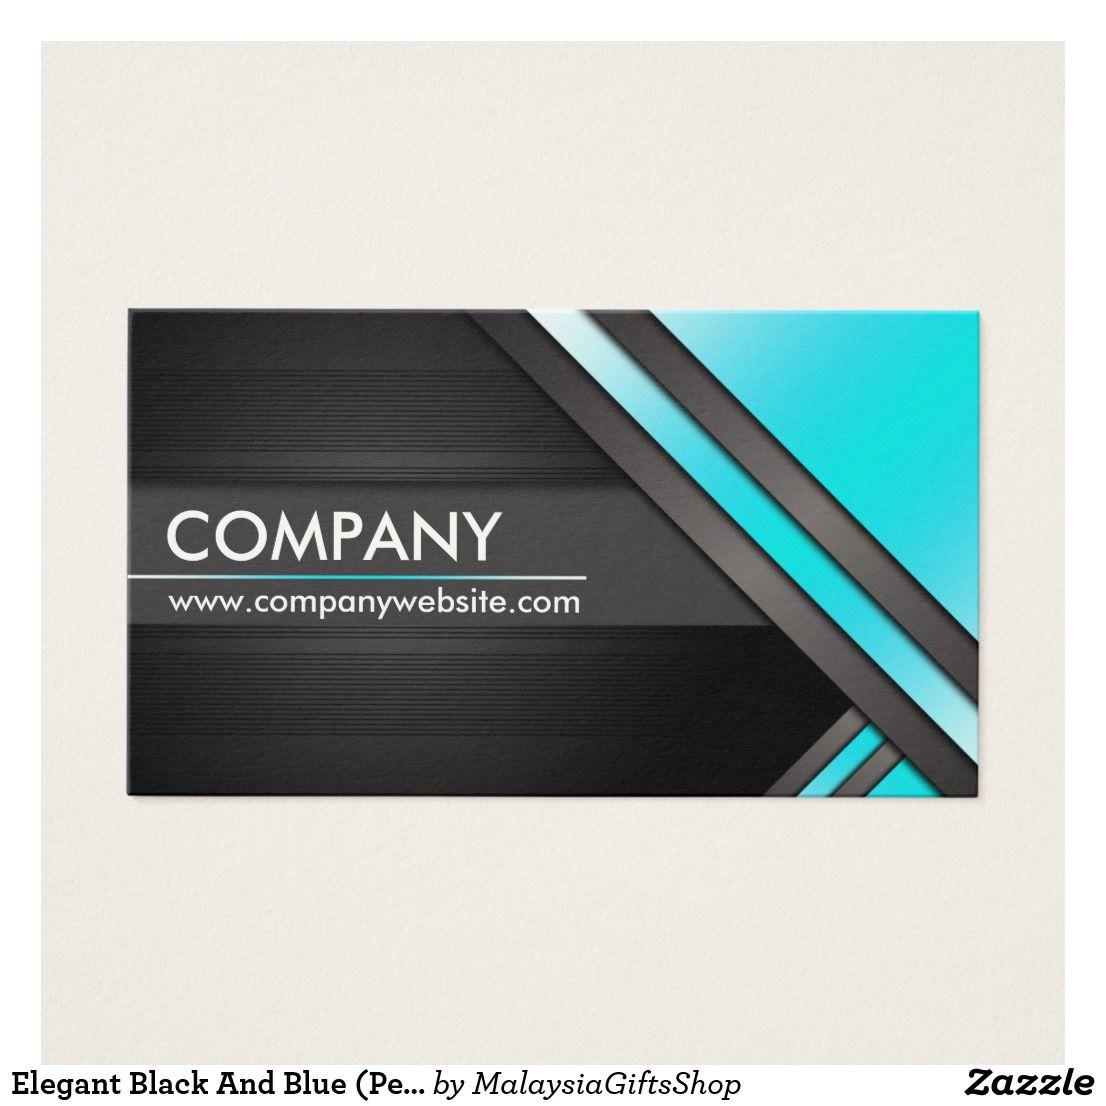 Elegant Black And Blue (Personalize) Business Card | Elegant ...